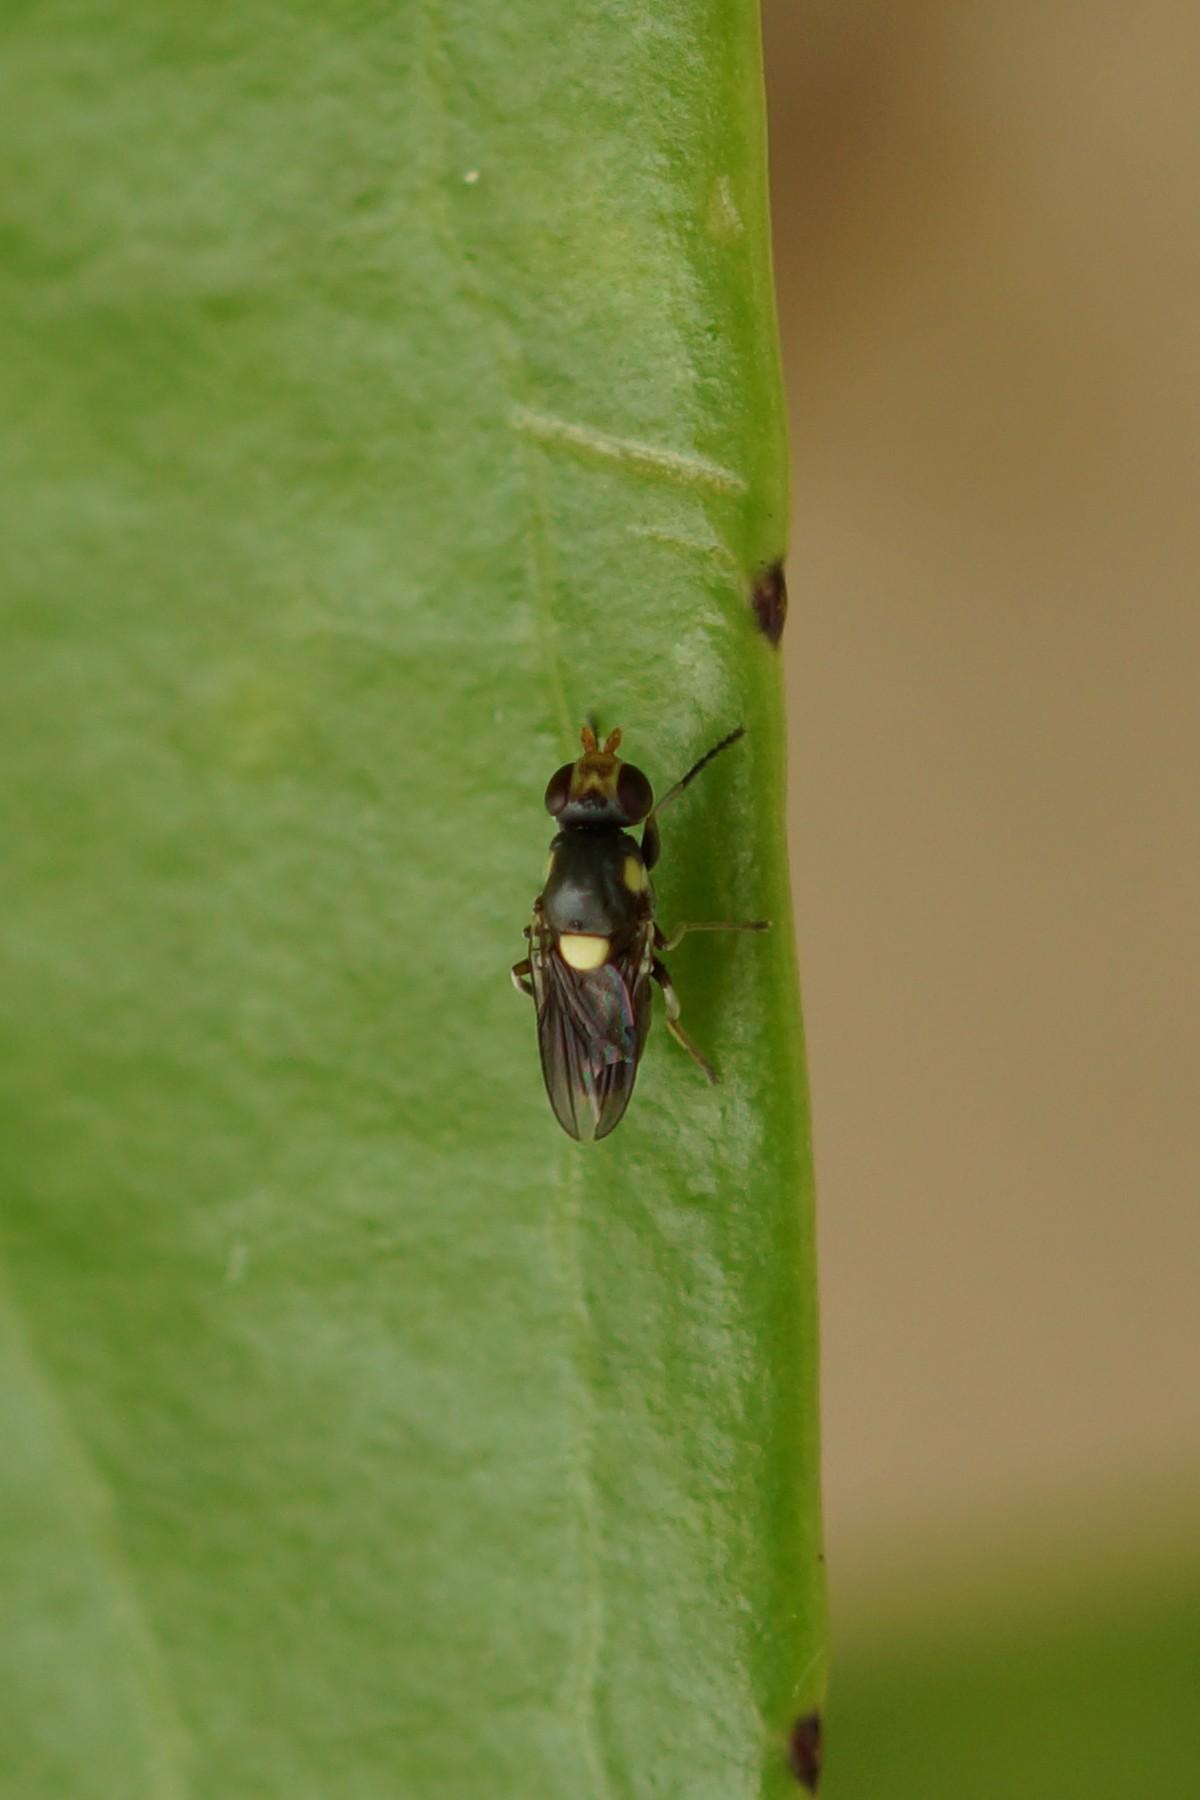 Chloropidae sp. (Halmfliege)